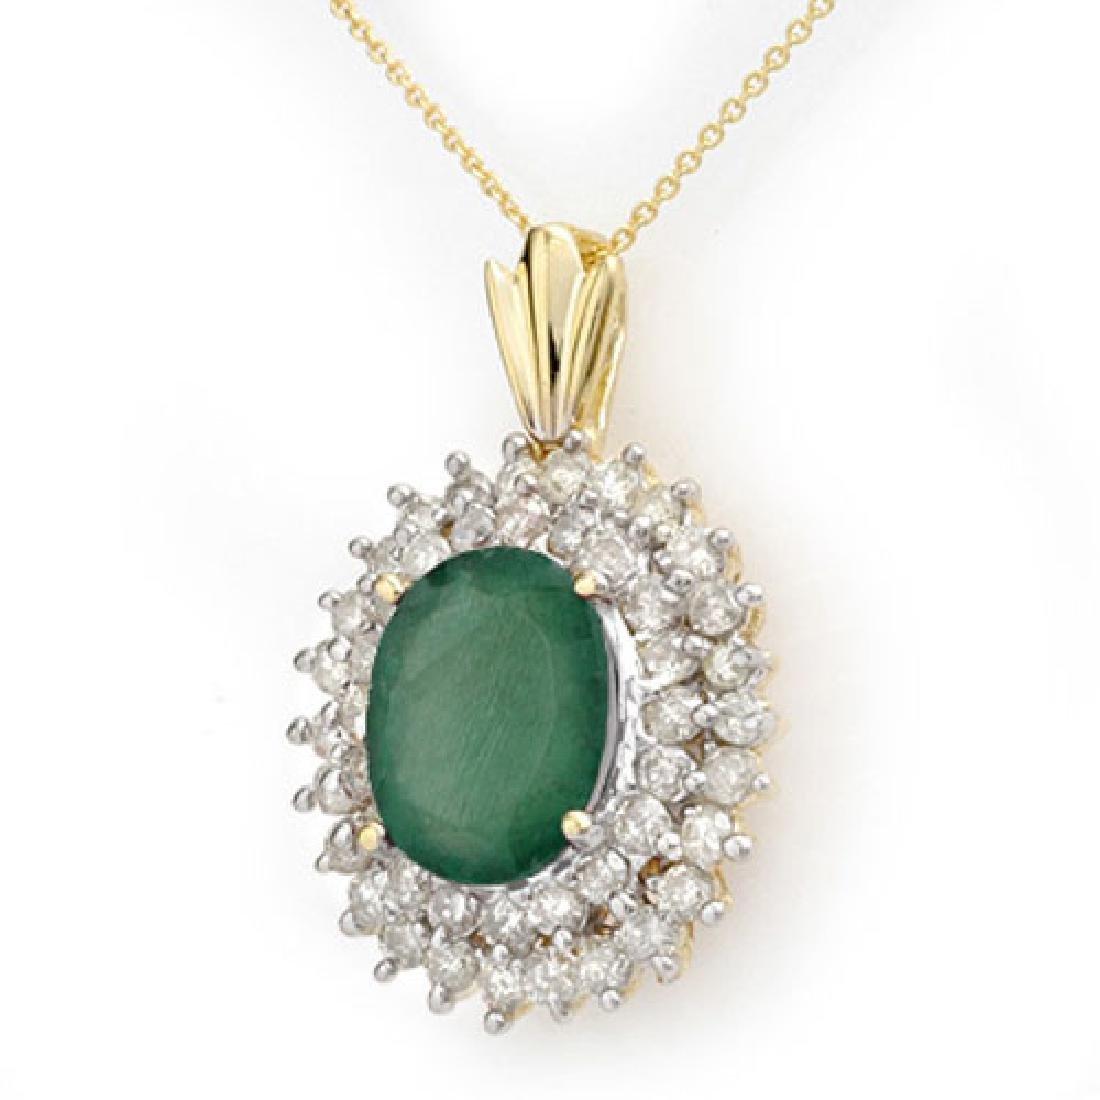 10.11 CTW Emerald & Diamond Pendant 14K Yellow Gold